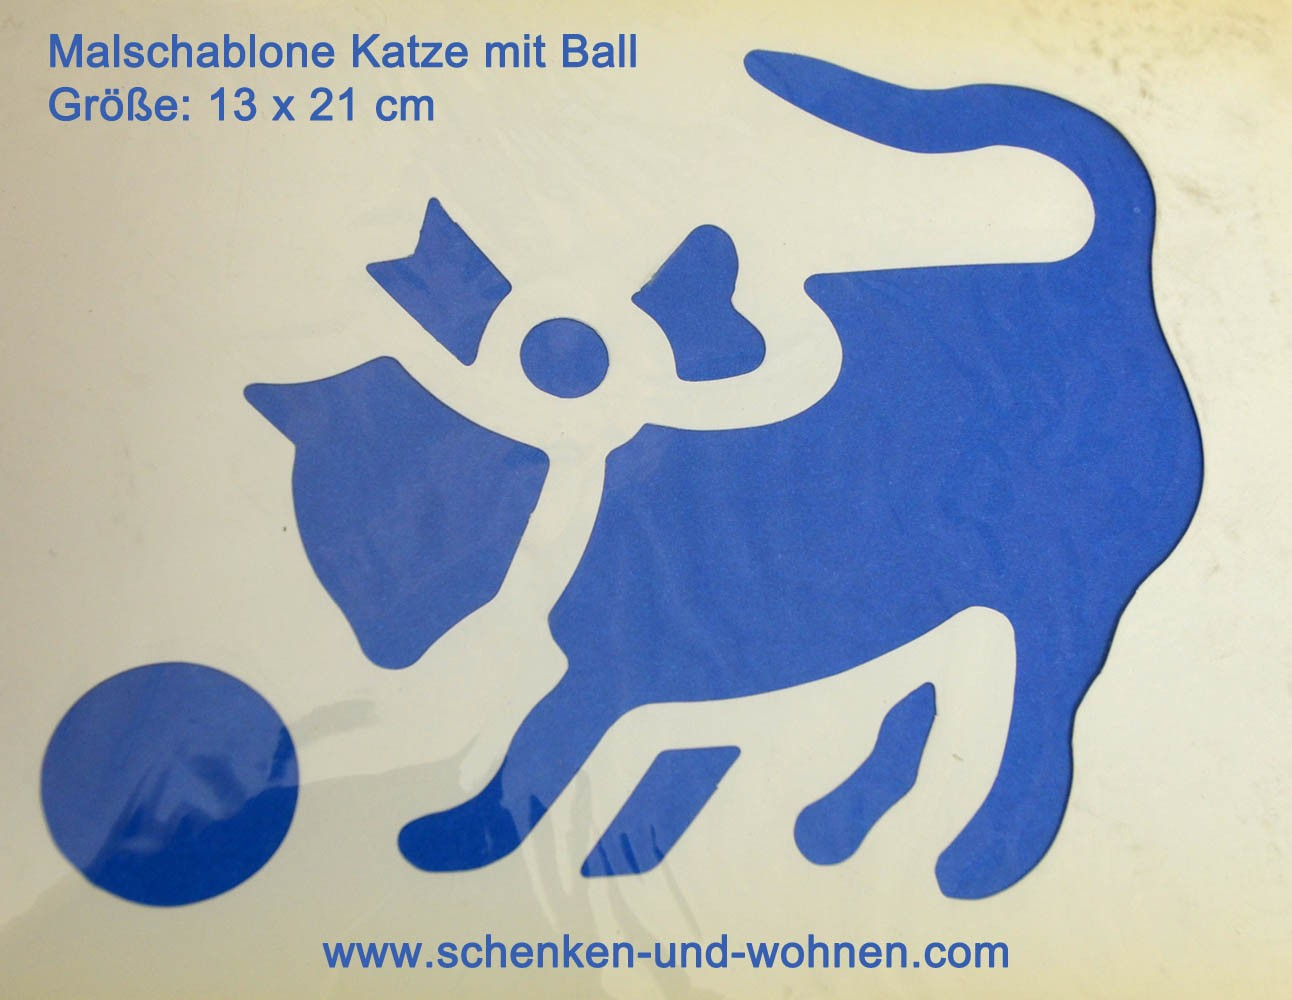 Wandschablone Malschablone Bordüre Katze mit Ball